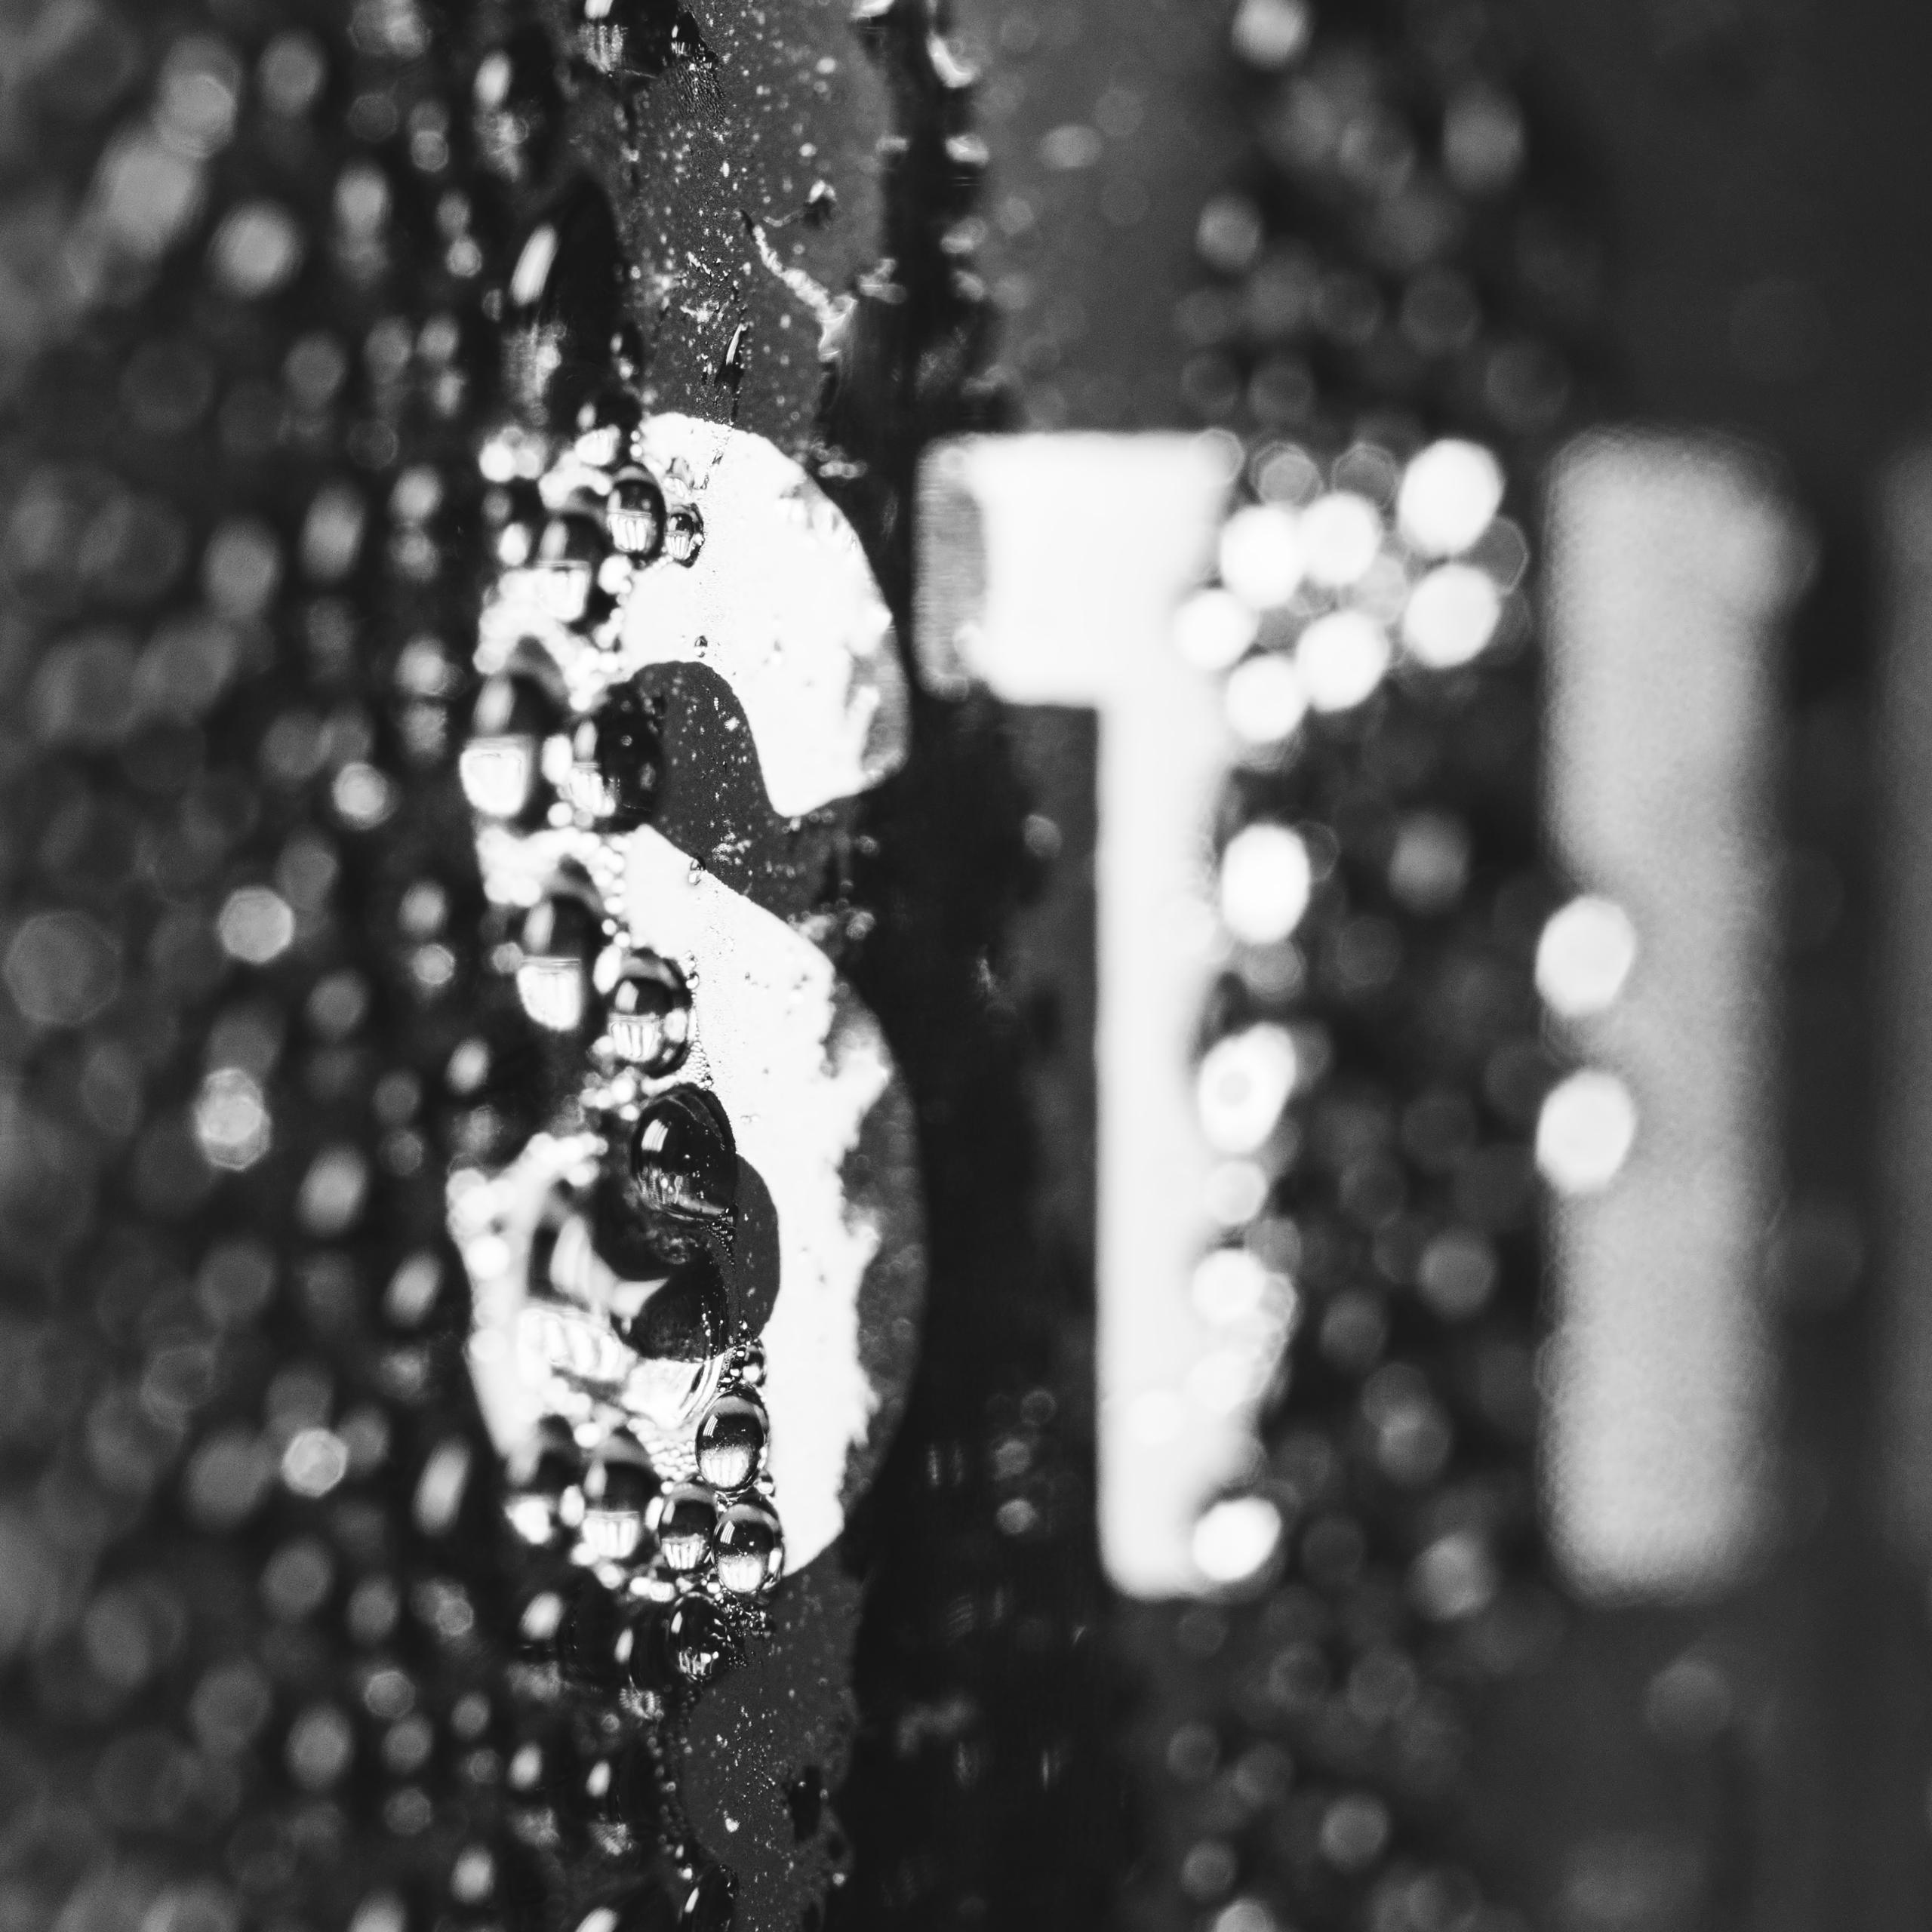 Droplets water glass bottle. hu - paddyc29 | ello